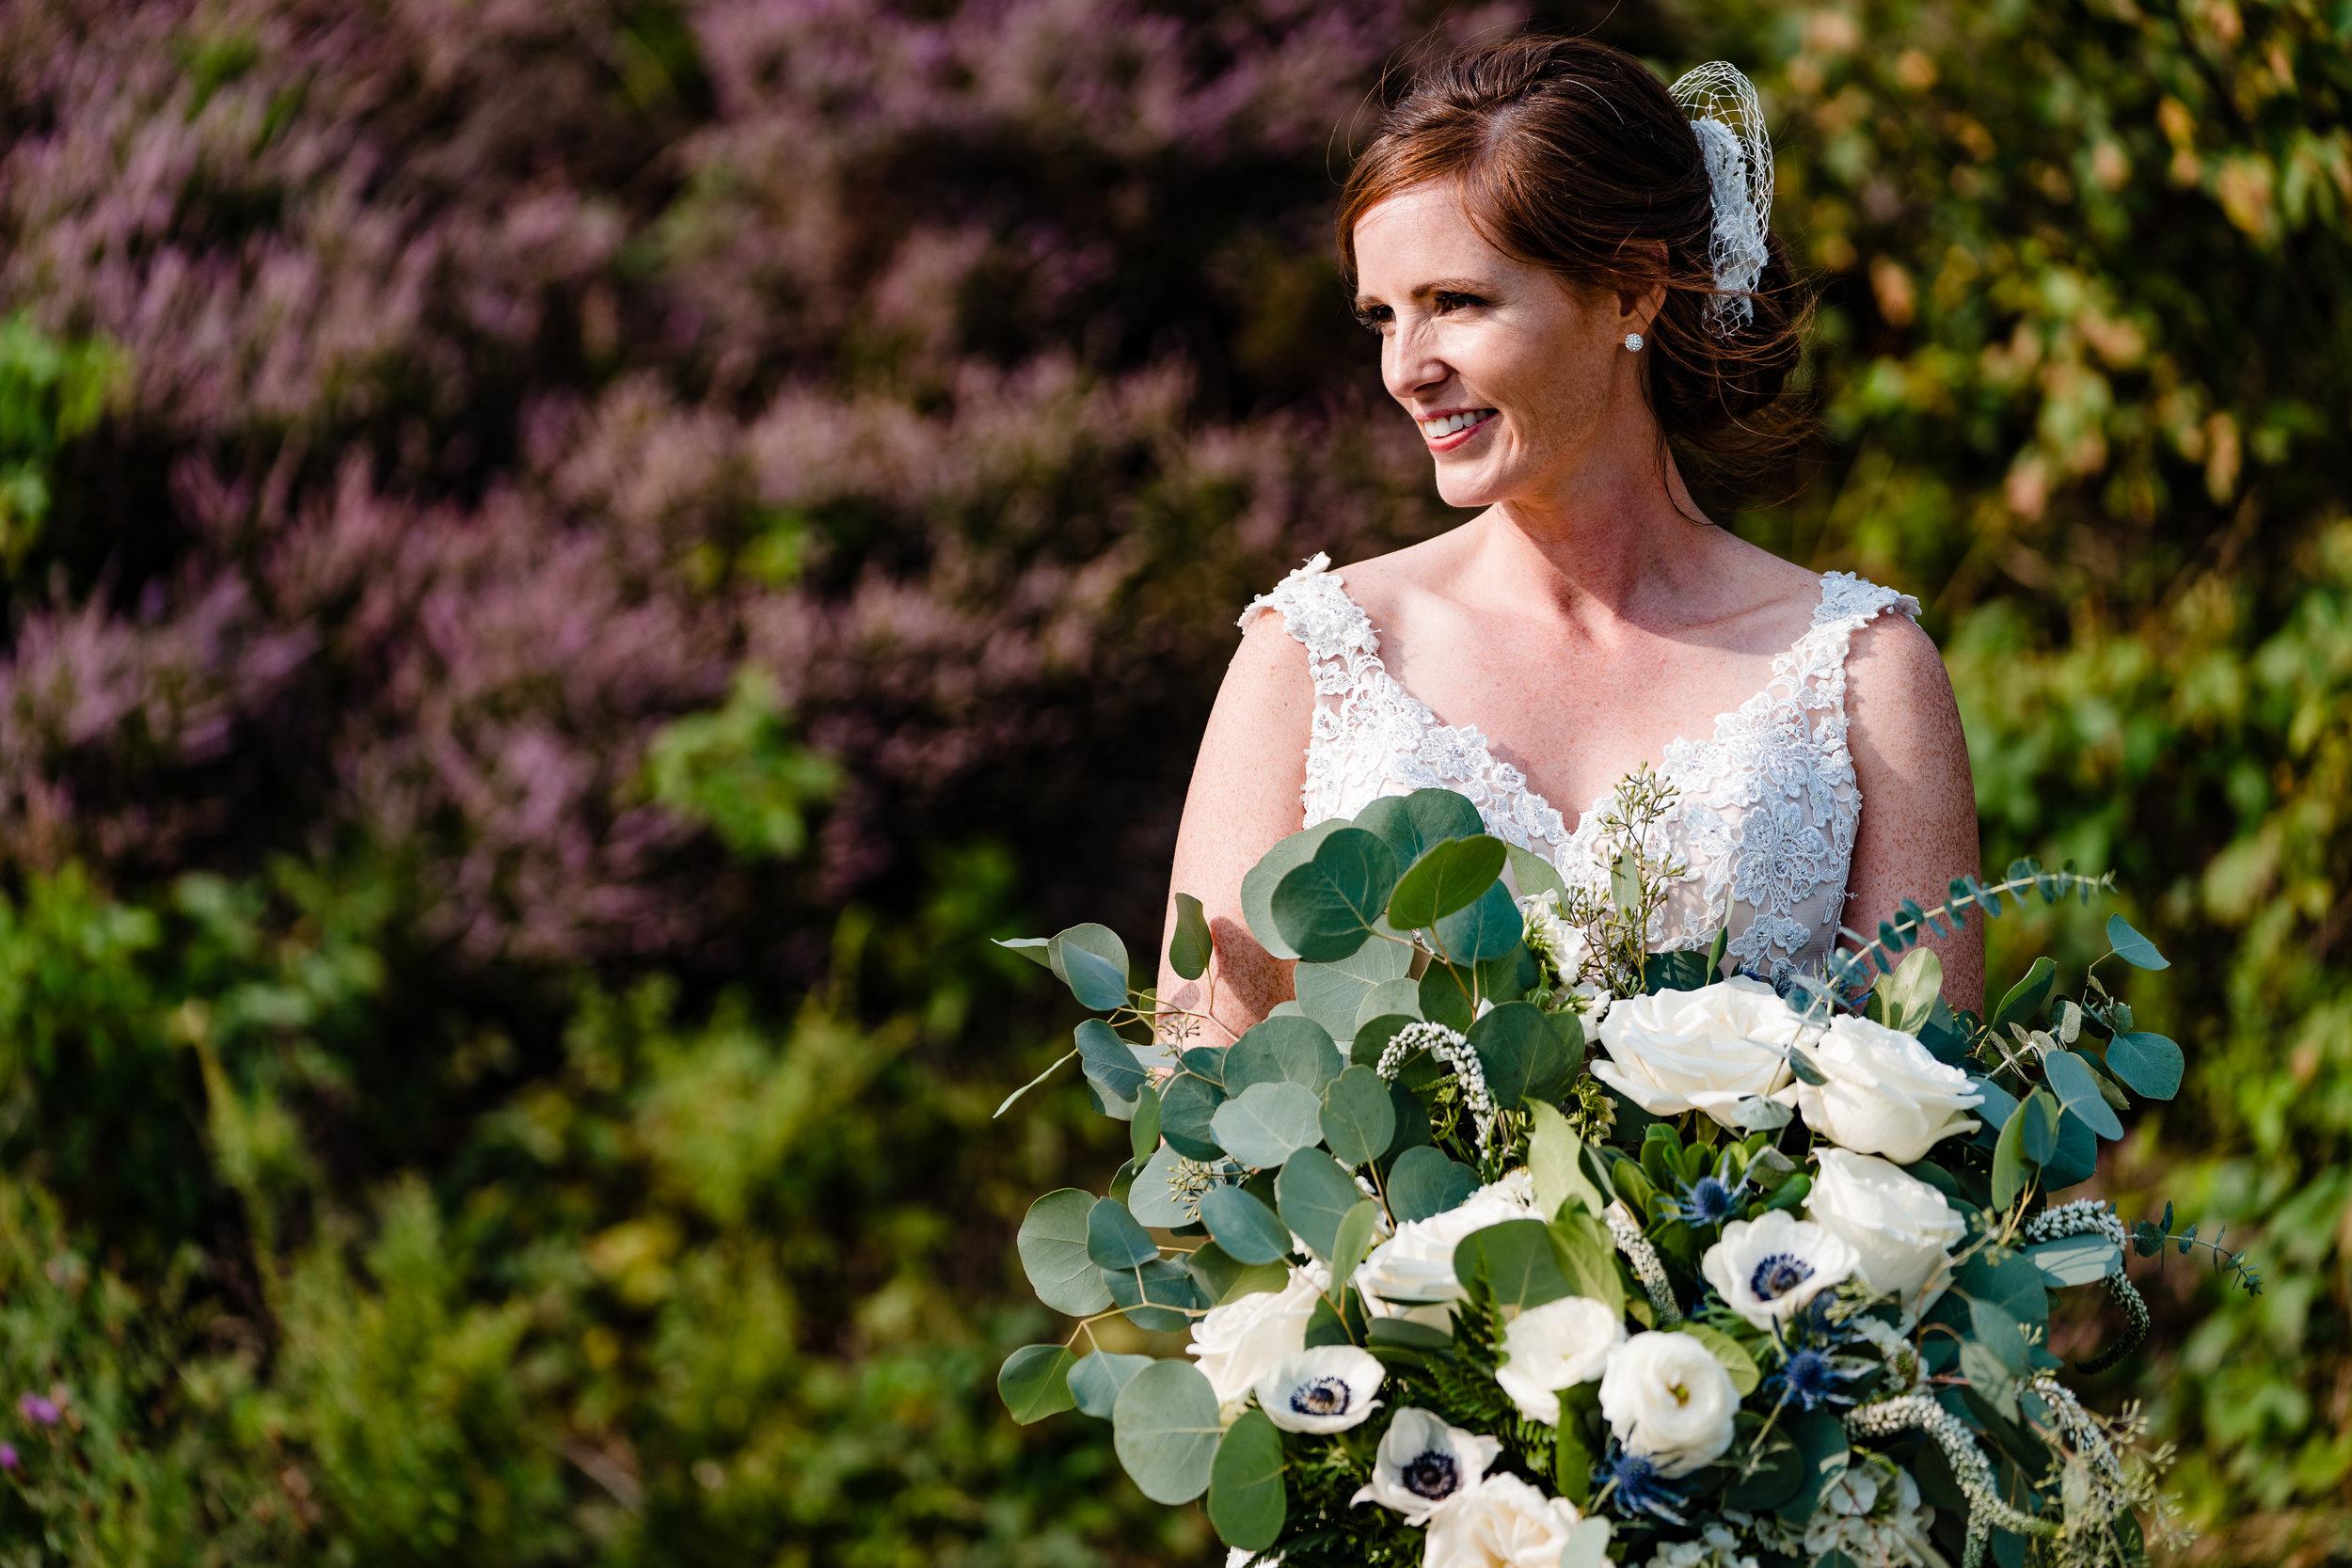 Jenna-Pat-374halifax-novascotia-weddingphotography-wedding-foxandfellow.jpg